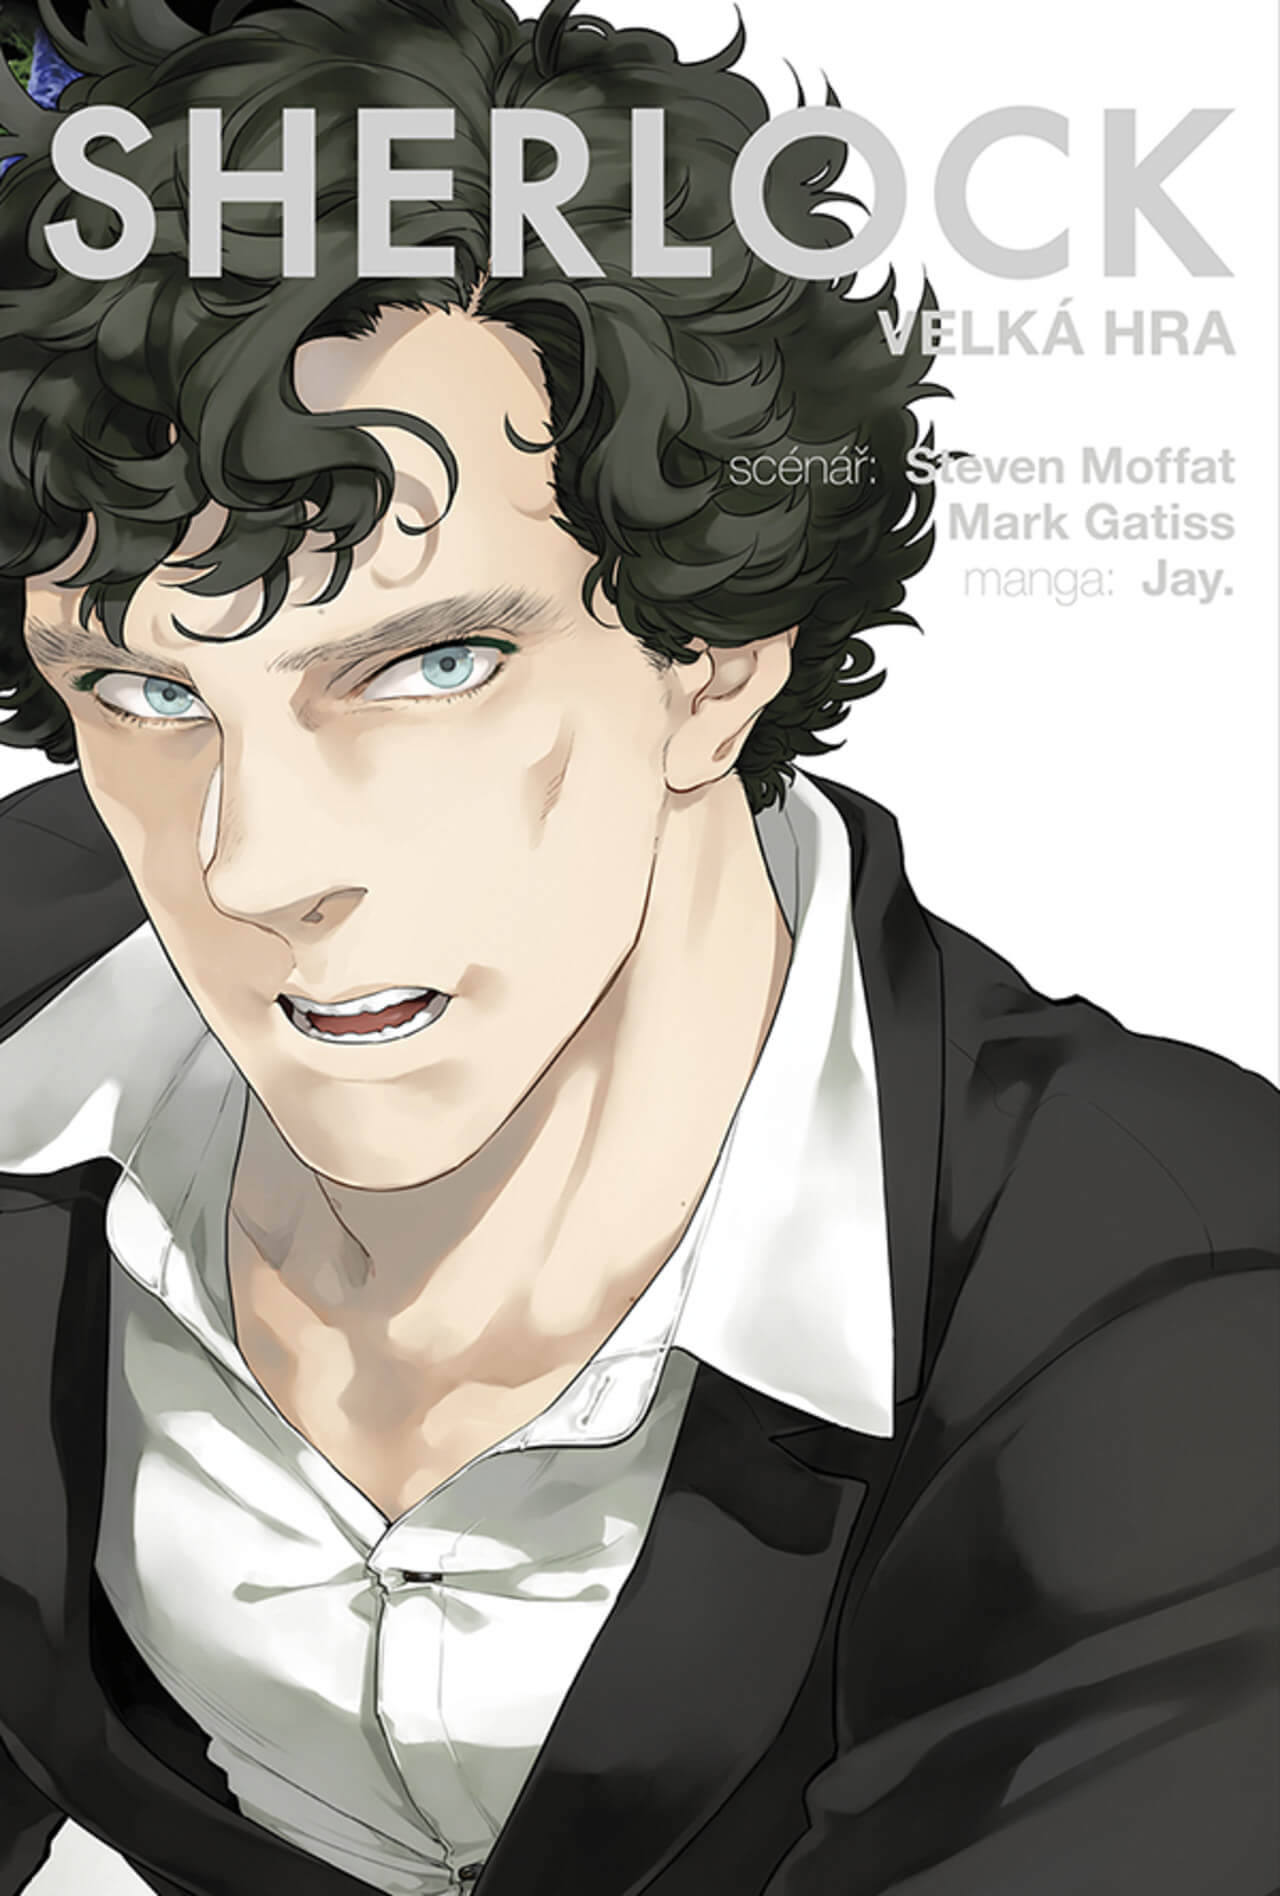 Sherlock3 Front RGB 72DPI 600